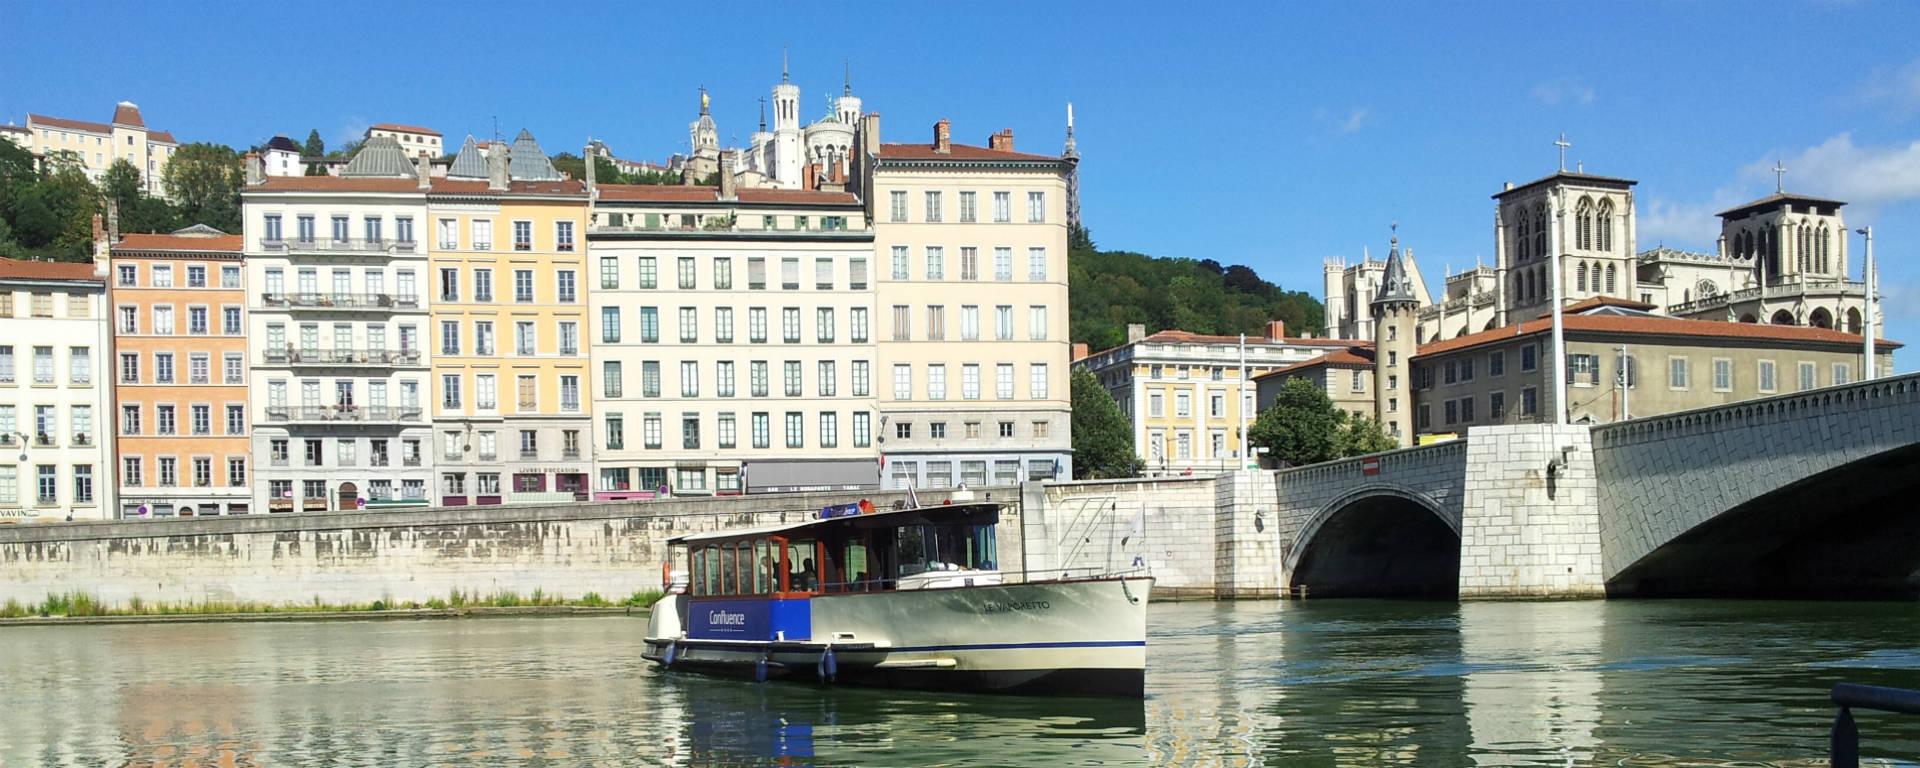 Vaporetto, navette fluviale Lyon